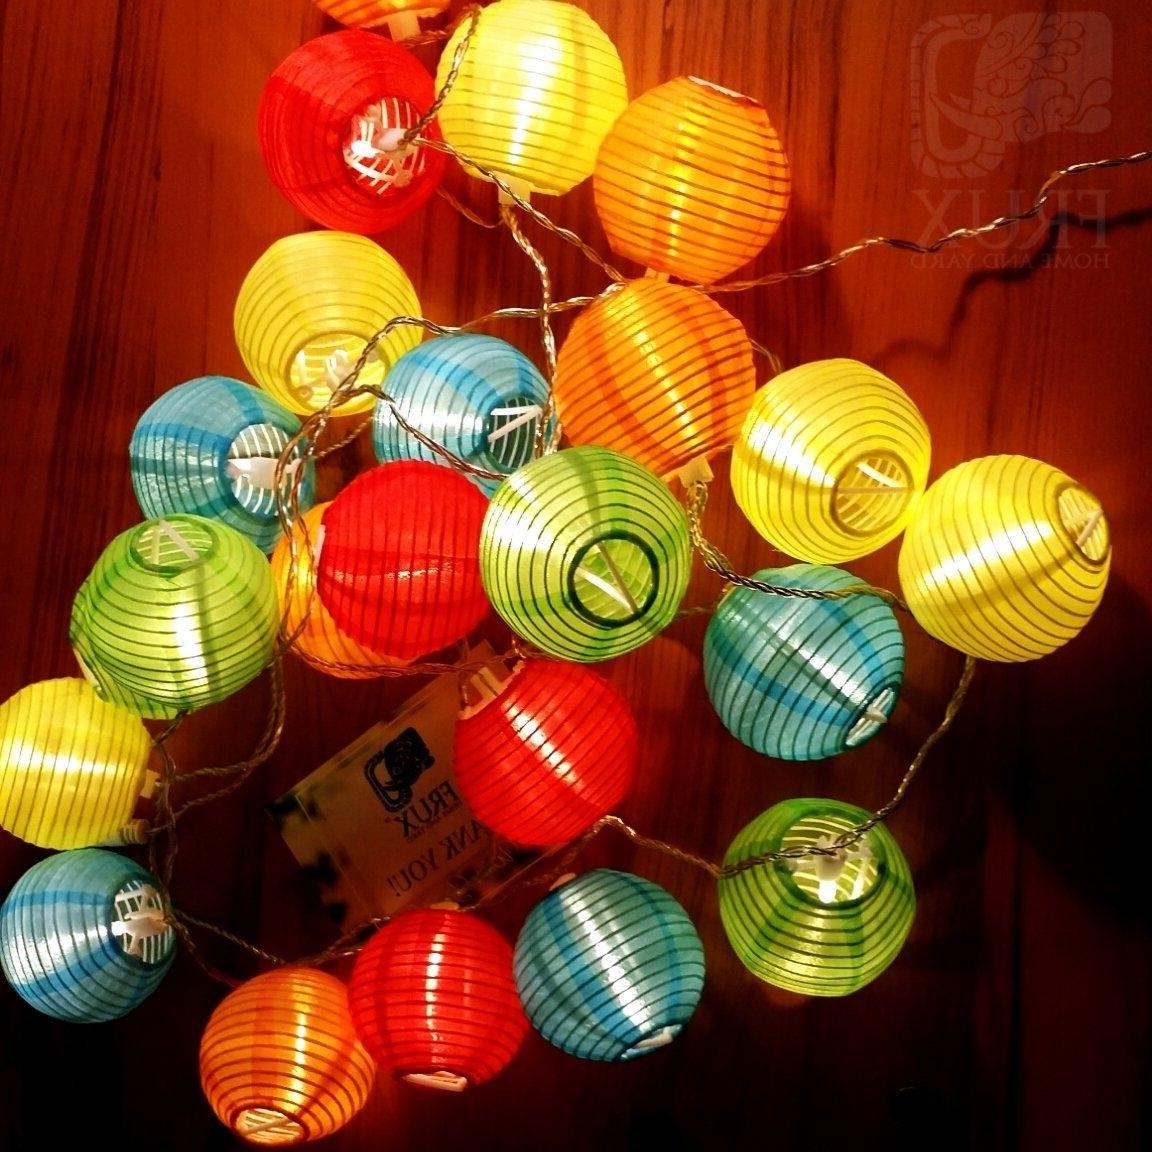 Outdoor Nylon Lanterns Pertaining To 2018 Lunaxia Nylon Lantern – Alice In Wonderland Shop (View 12 of 20)